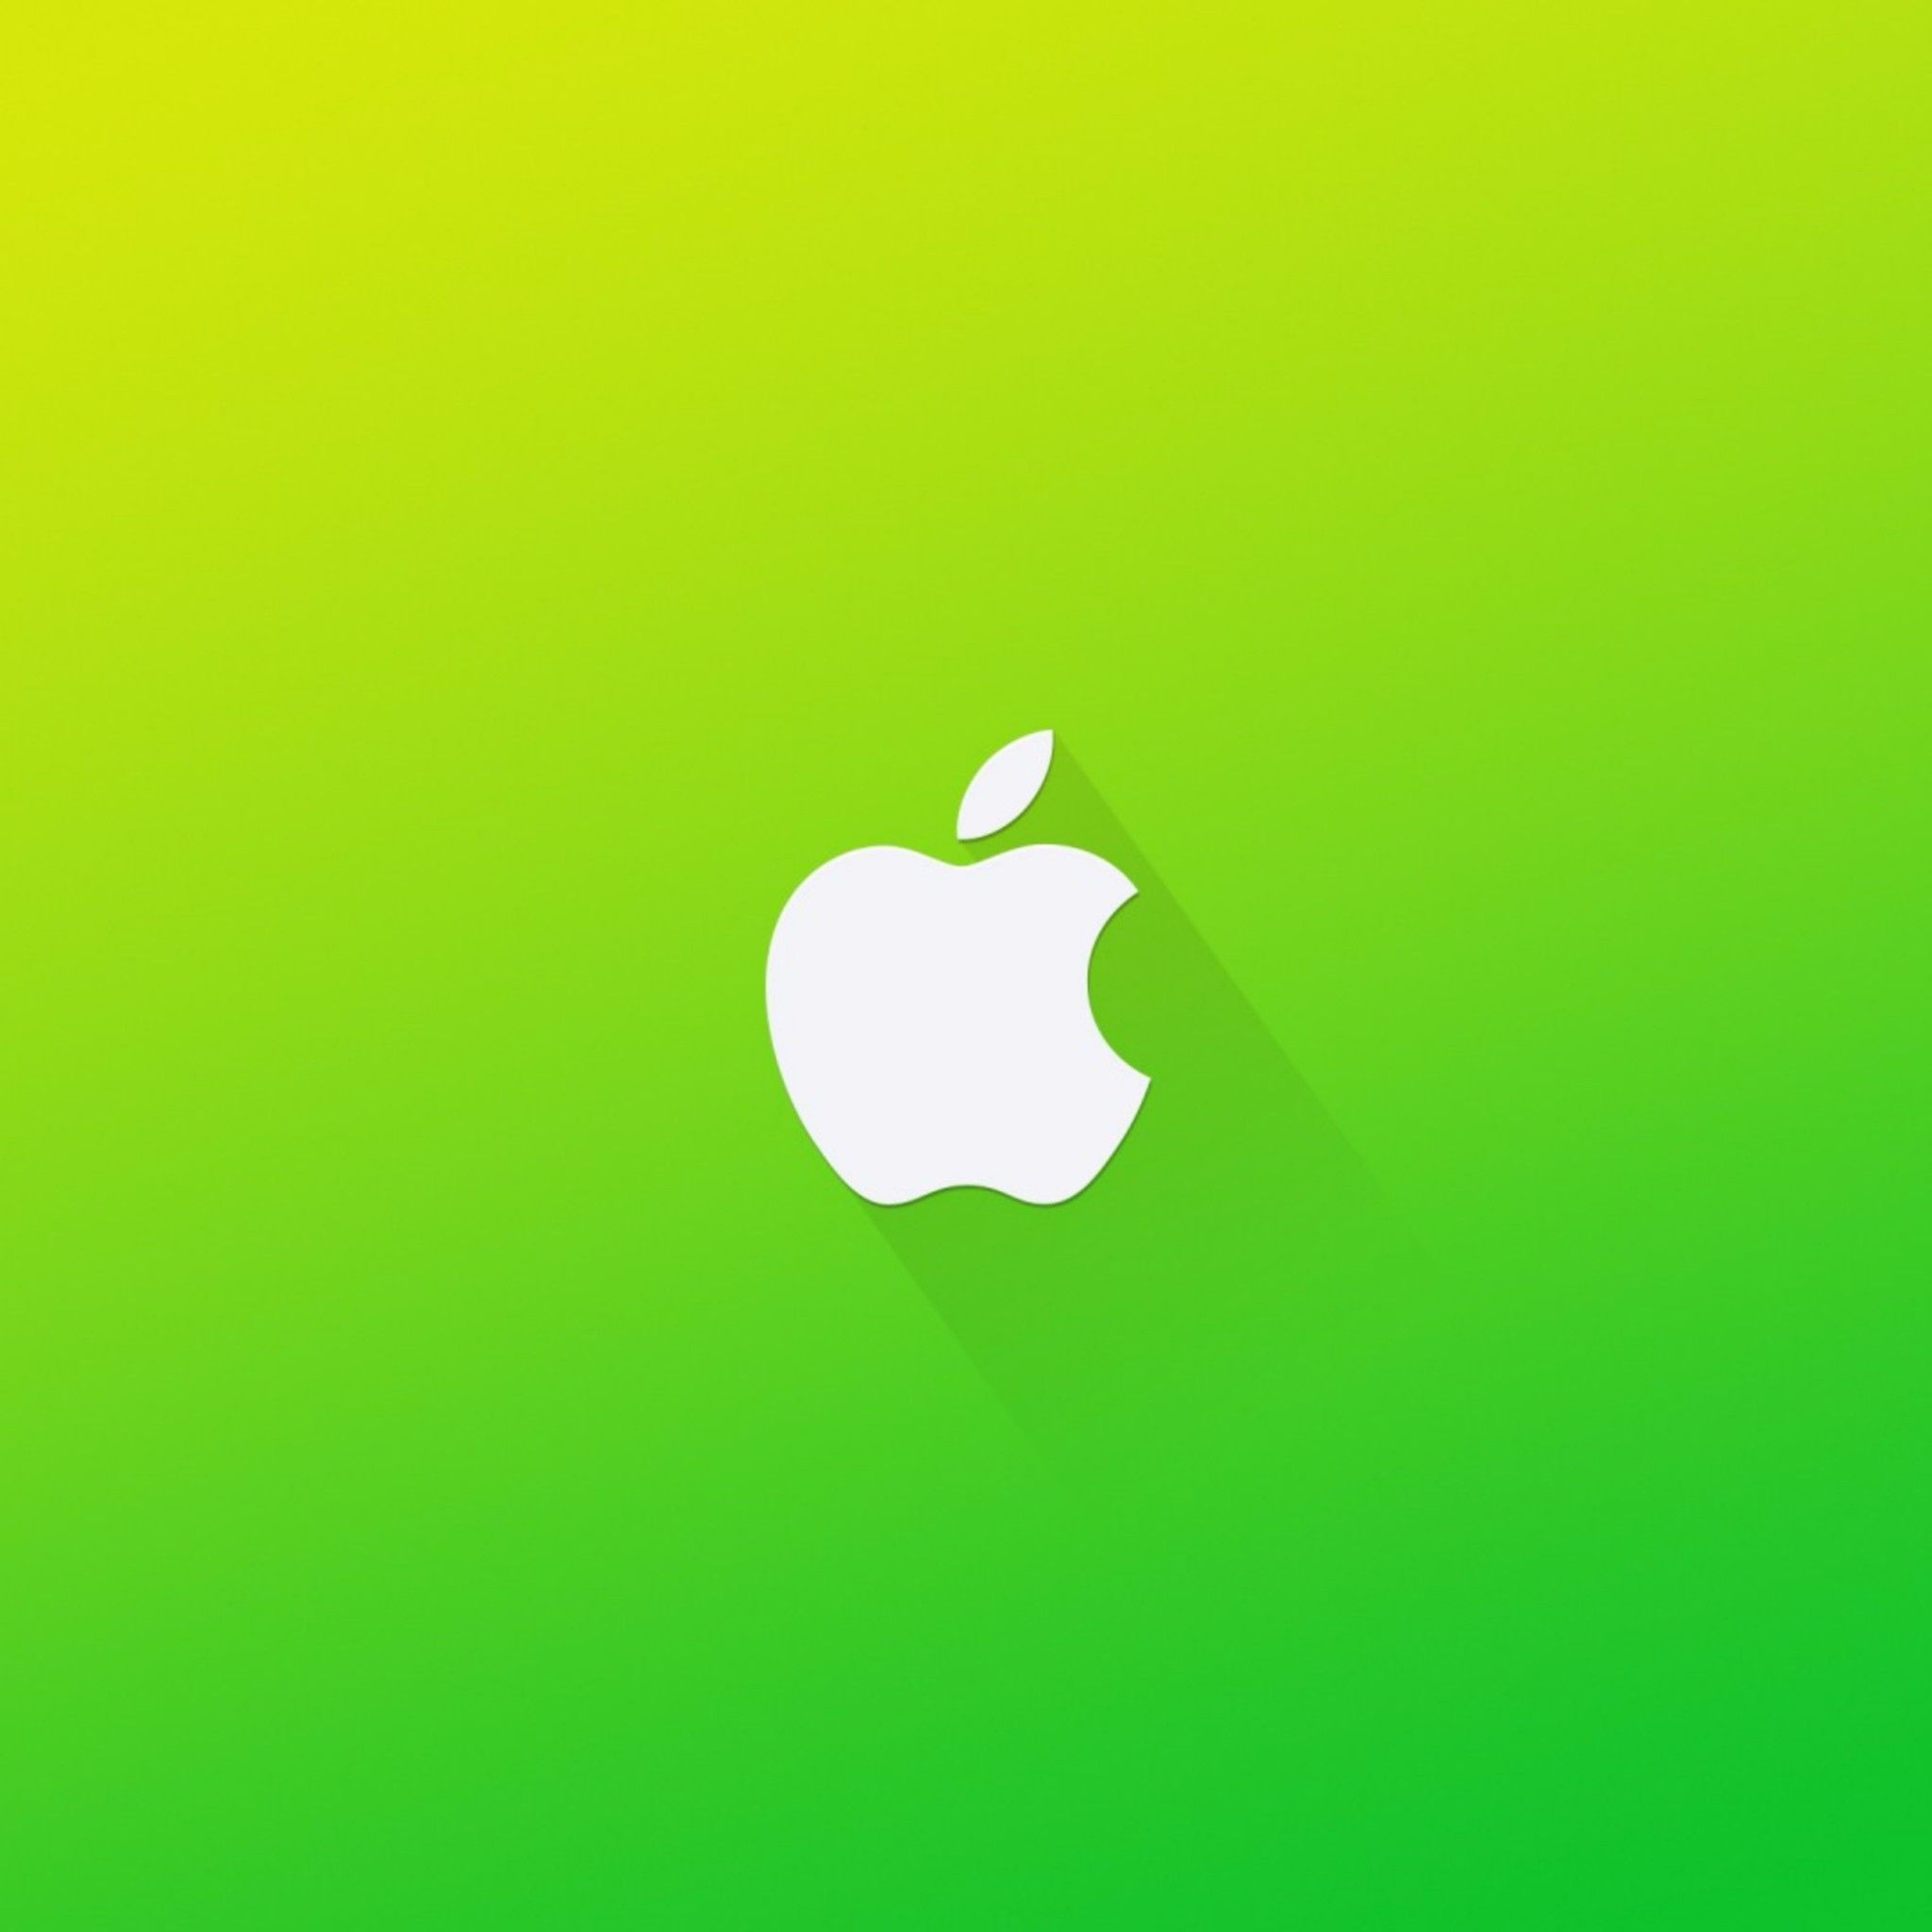 apple logo wallpaper hd iphone - vector and clip art inspiration •